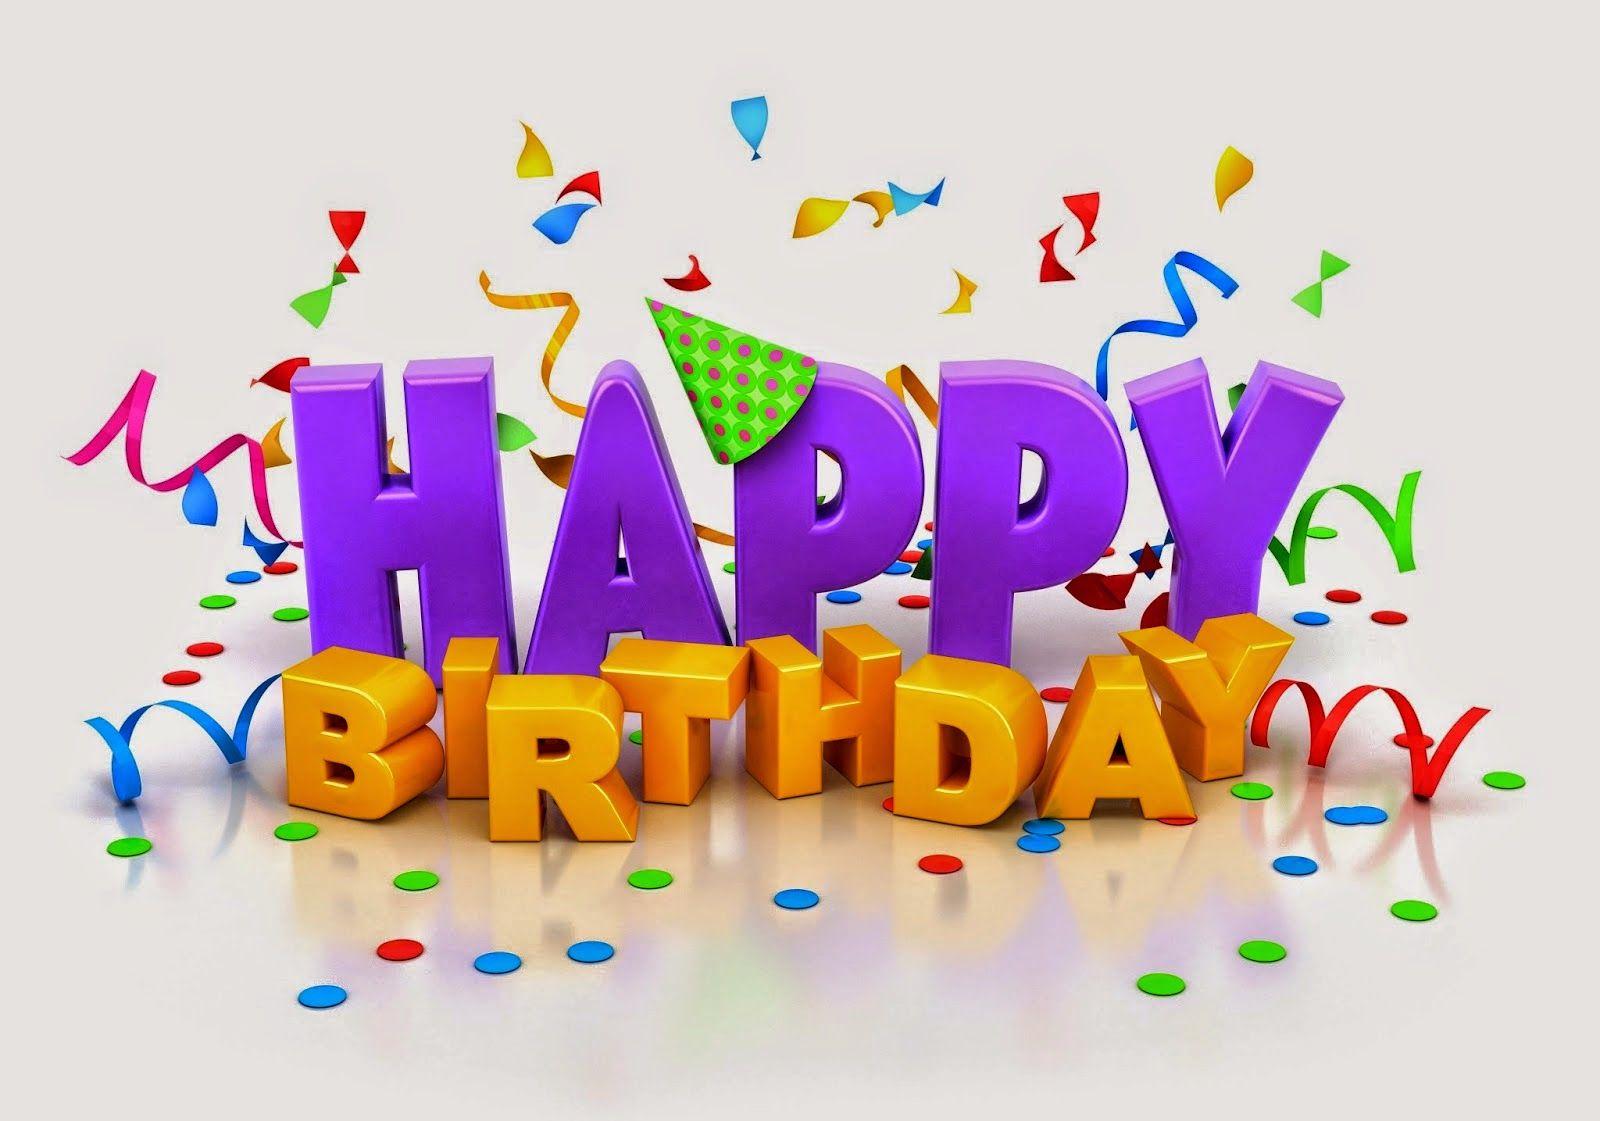 Happybirthdaywishesonline wishes pinterest